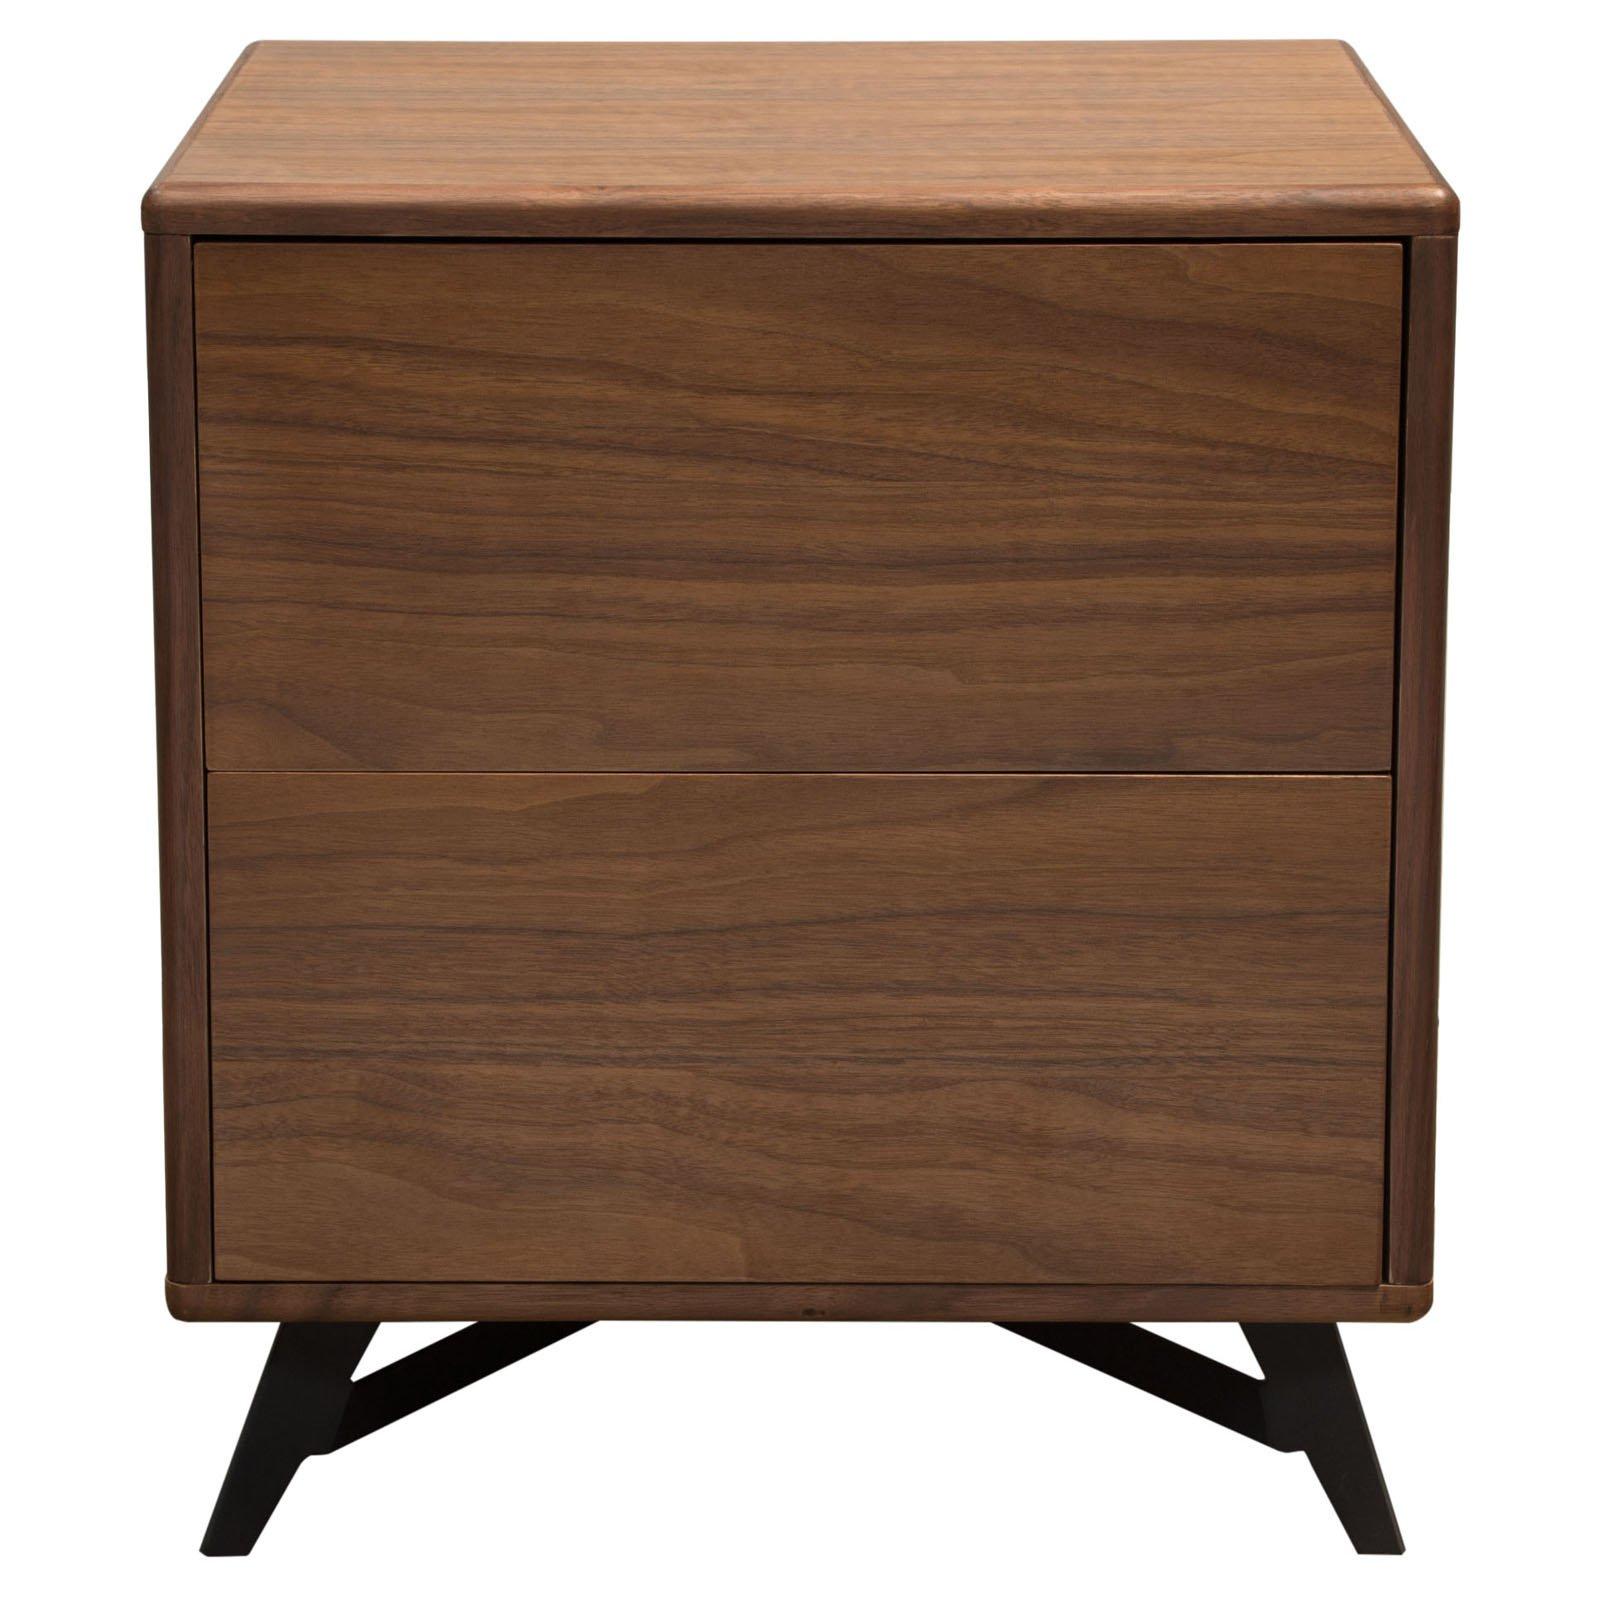 Diamond Sofa Tempo End Table with Drawer Storage